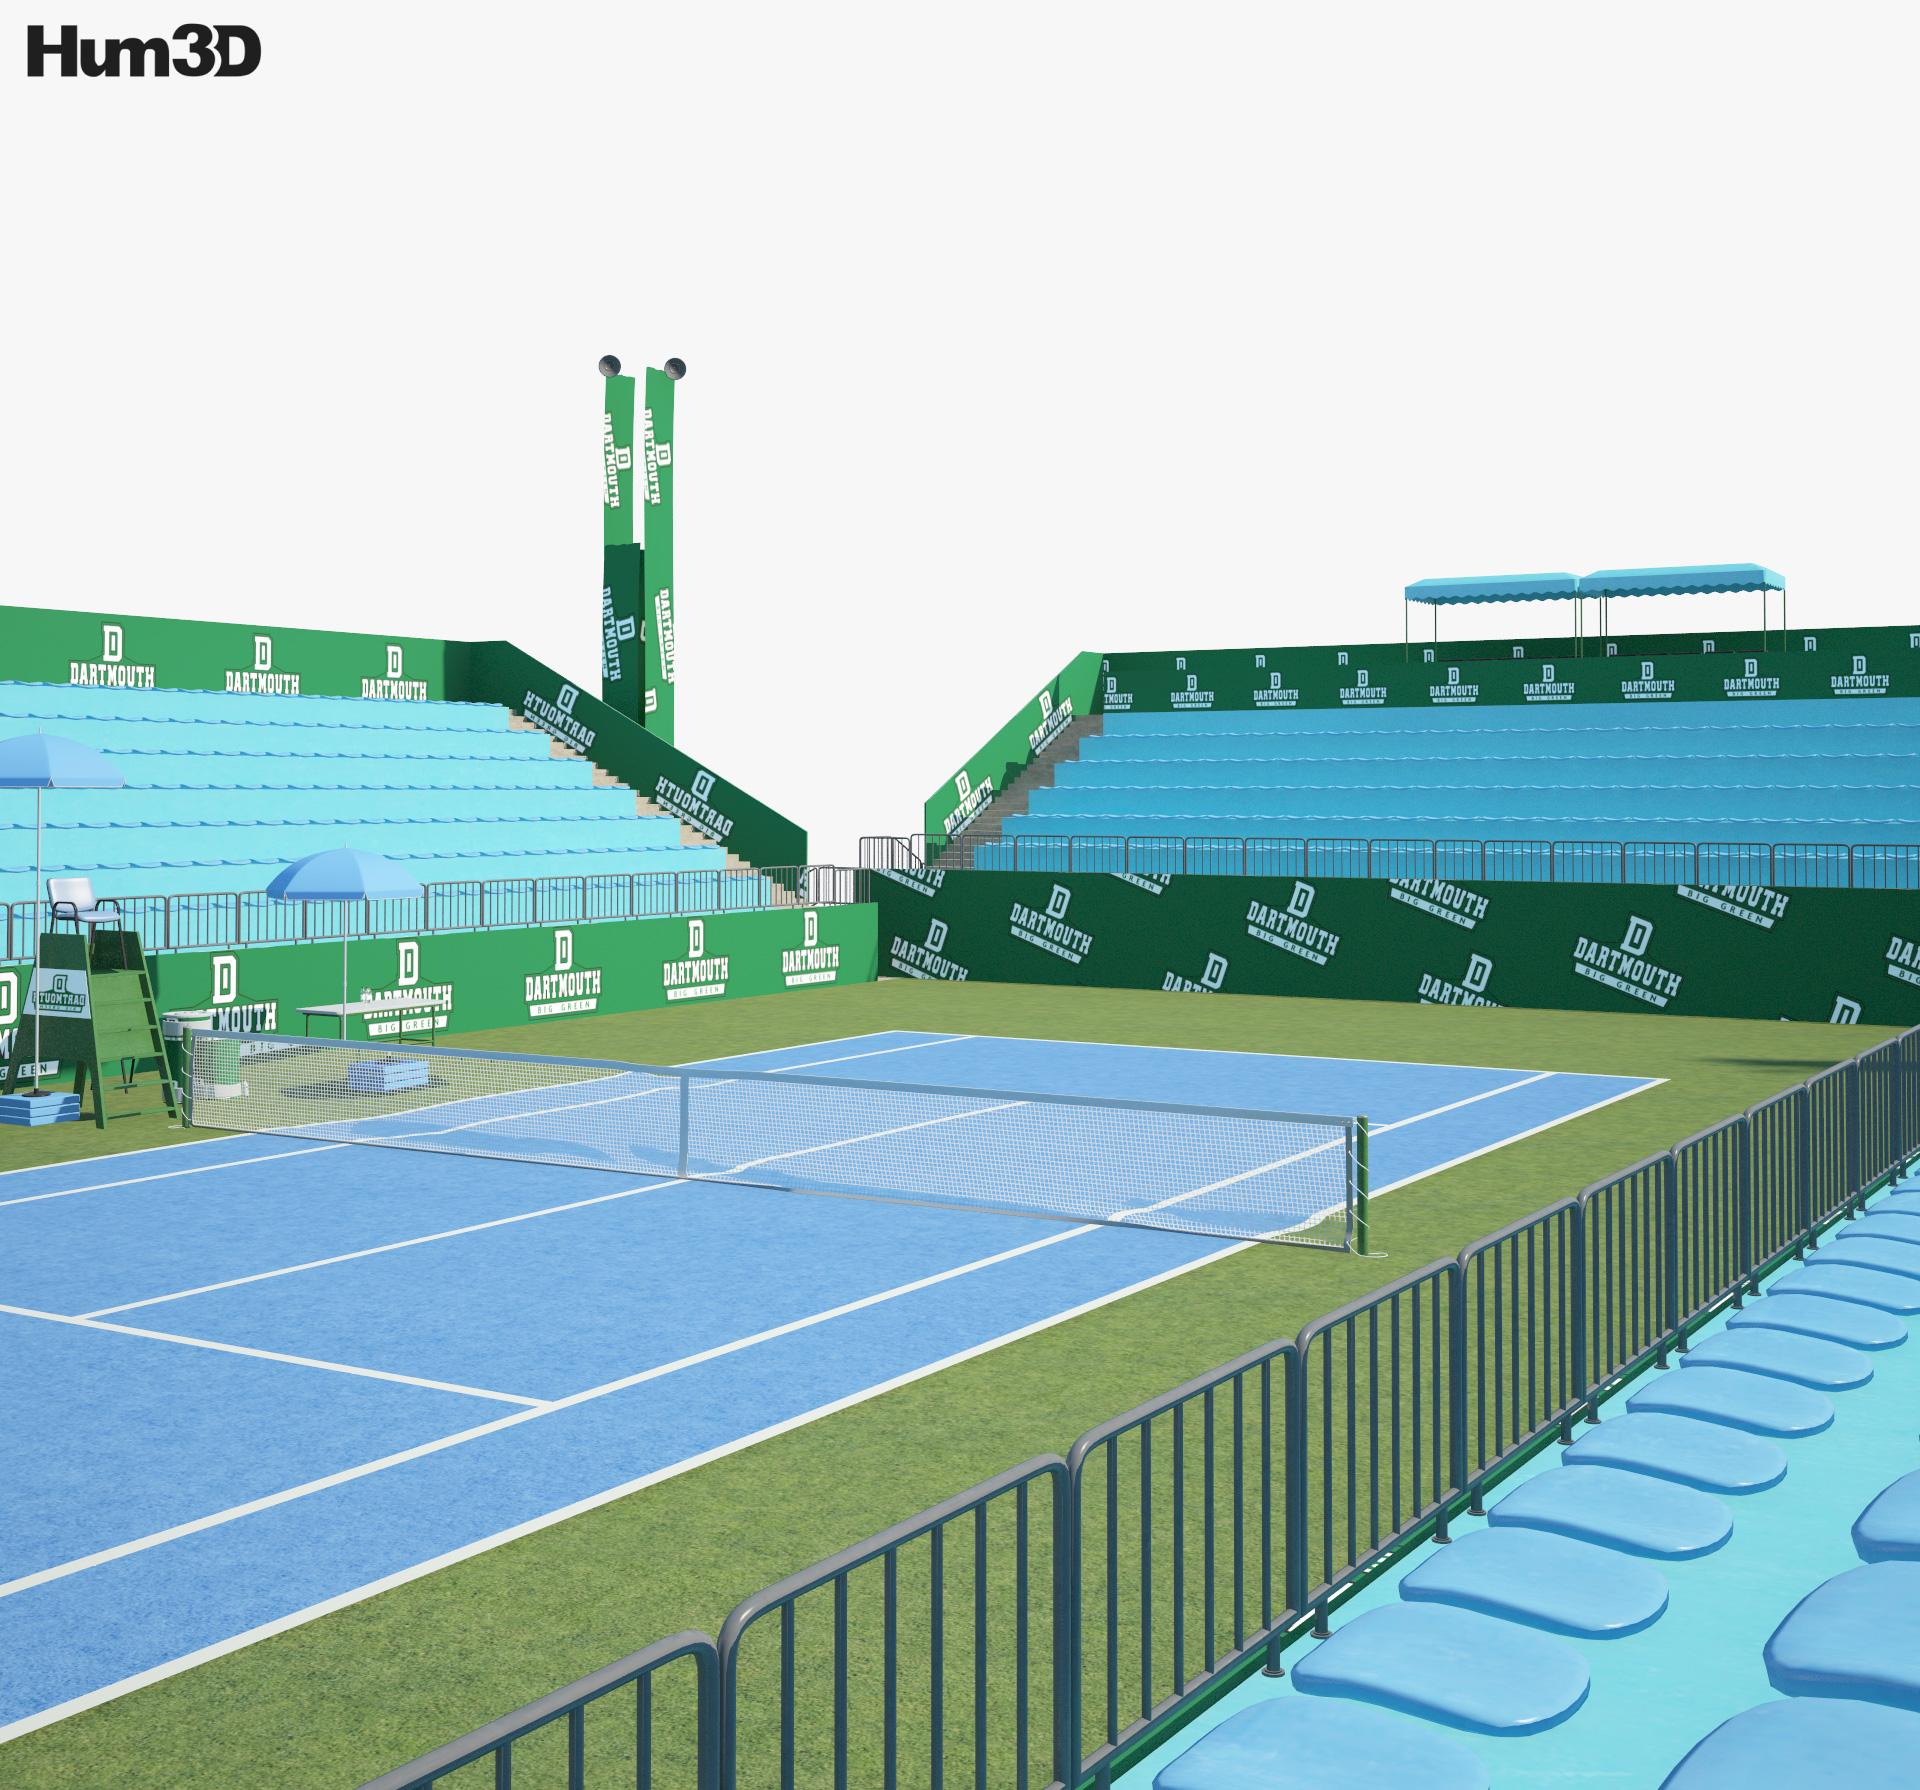 Tennis Arena 3d model